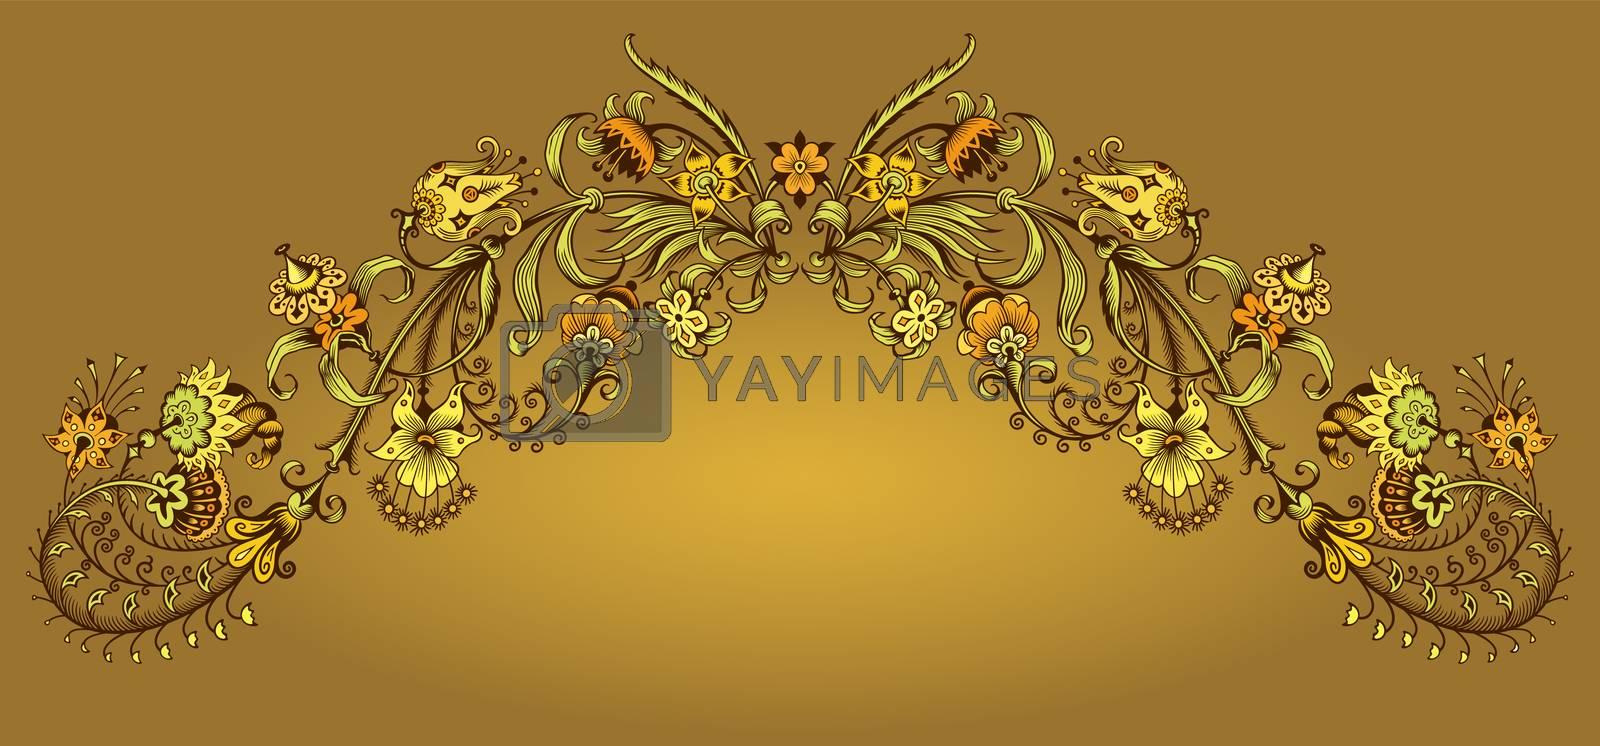 Floral hand drawn vector vintage border. Engraved nature elements and objects illustration. Frame design.